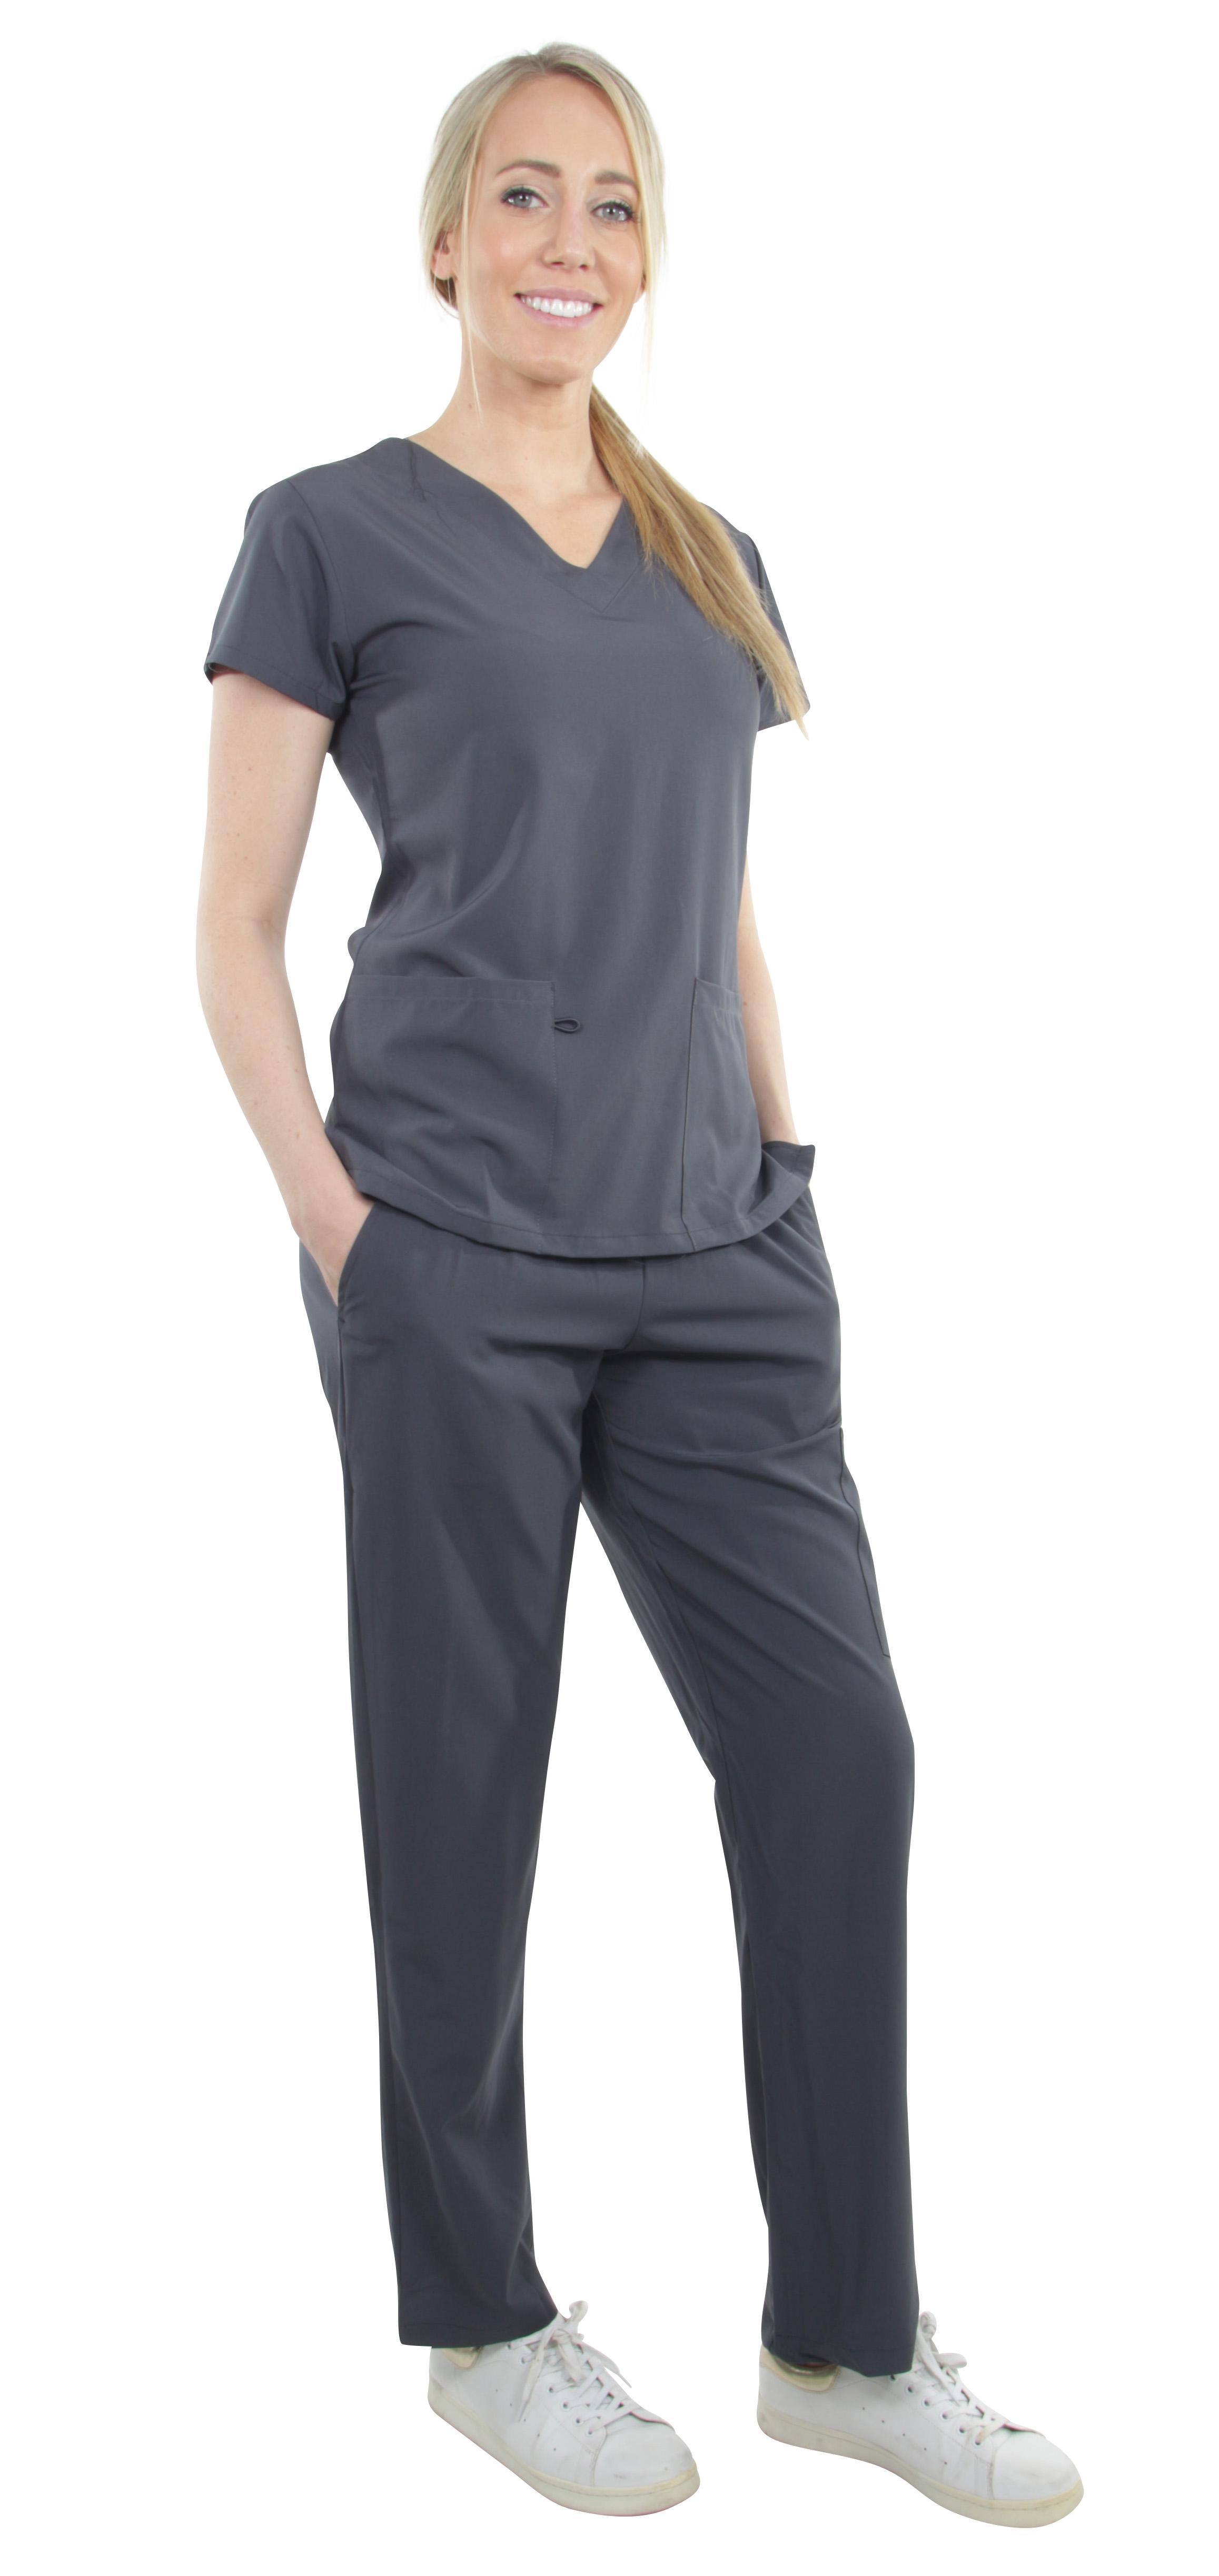 Unisex-Performance-Stretch-Medical-Uniform-Five-Pockets-V-Neck-Scrubs-Sets thumbnail 47